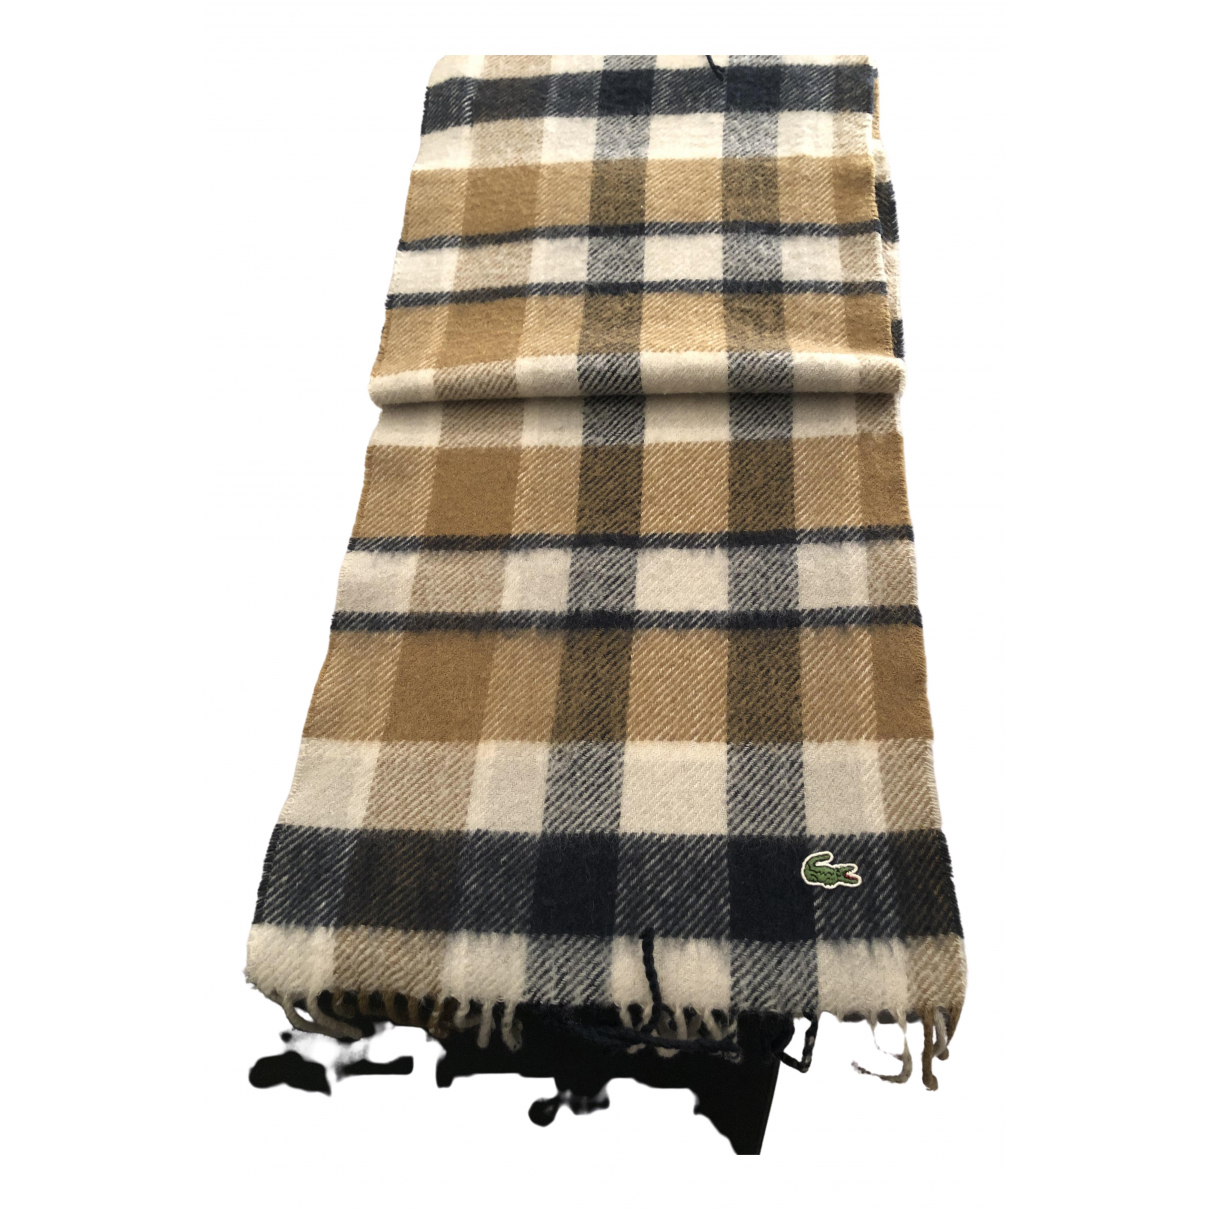 Pañuelo / bufanda de Lana Lacoste